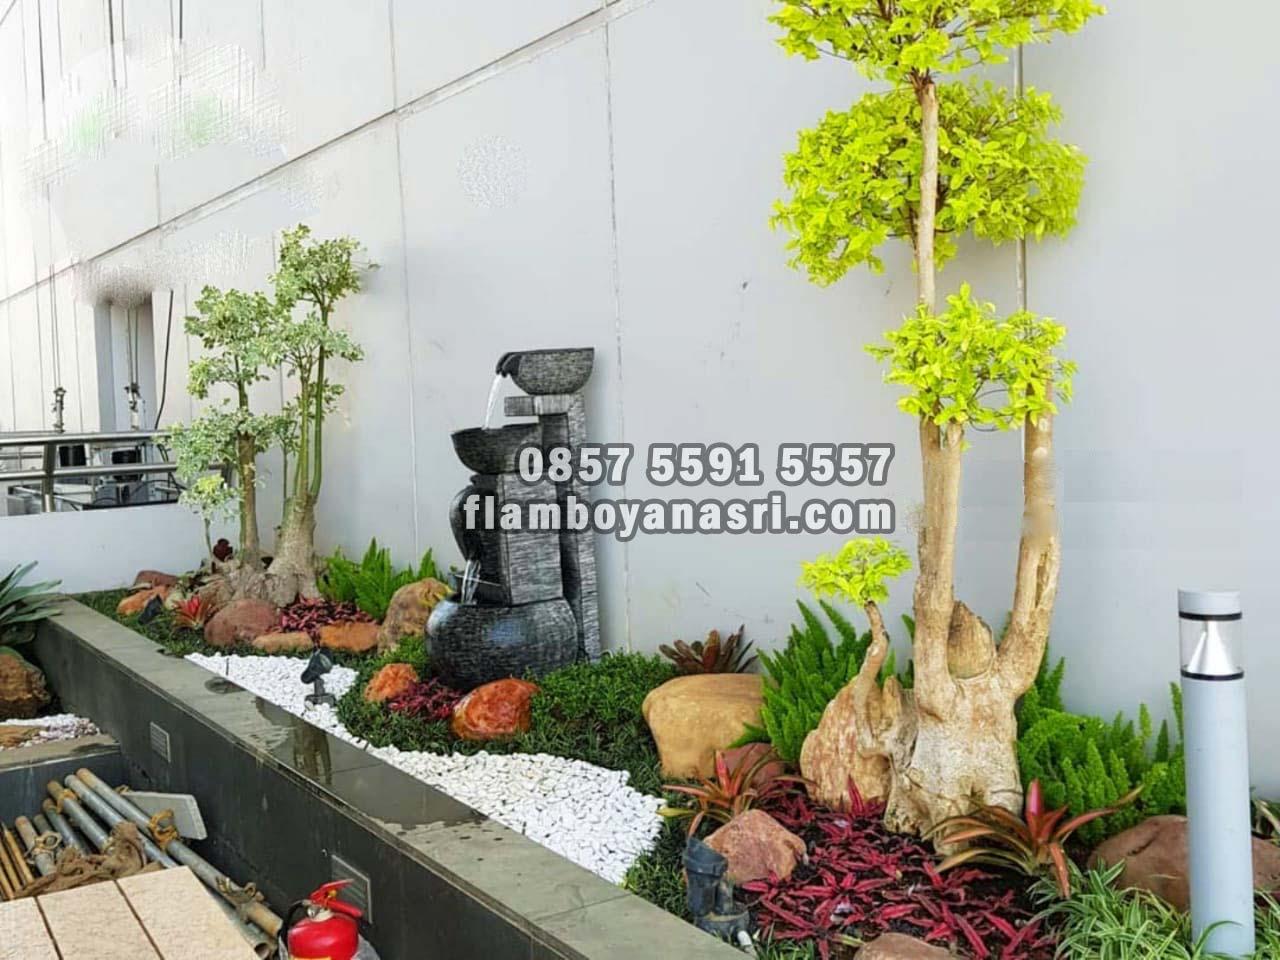 22 Inspirasi Desain Taman Kering Dry Garden Jasa Tukang Taman